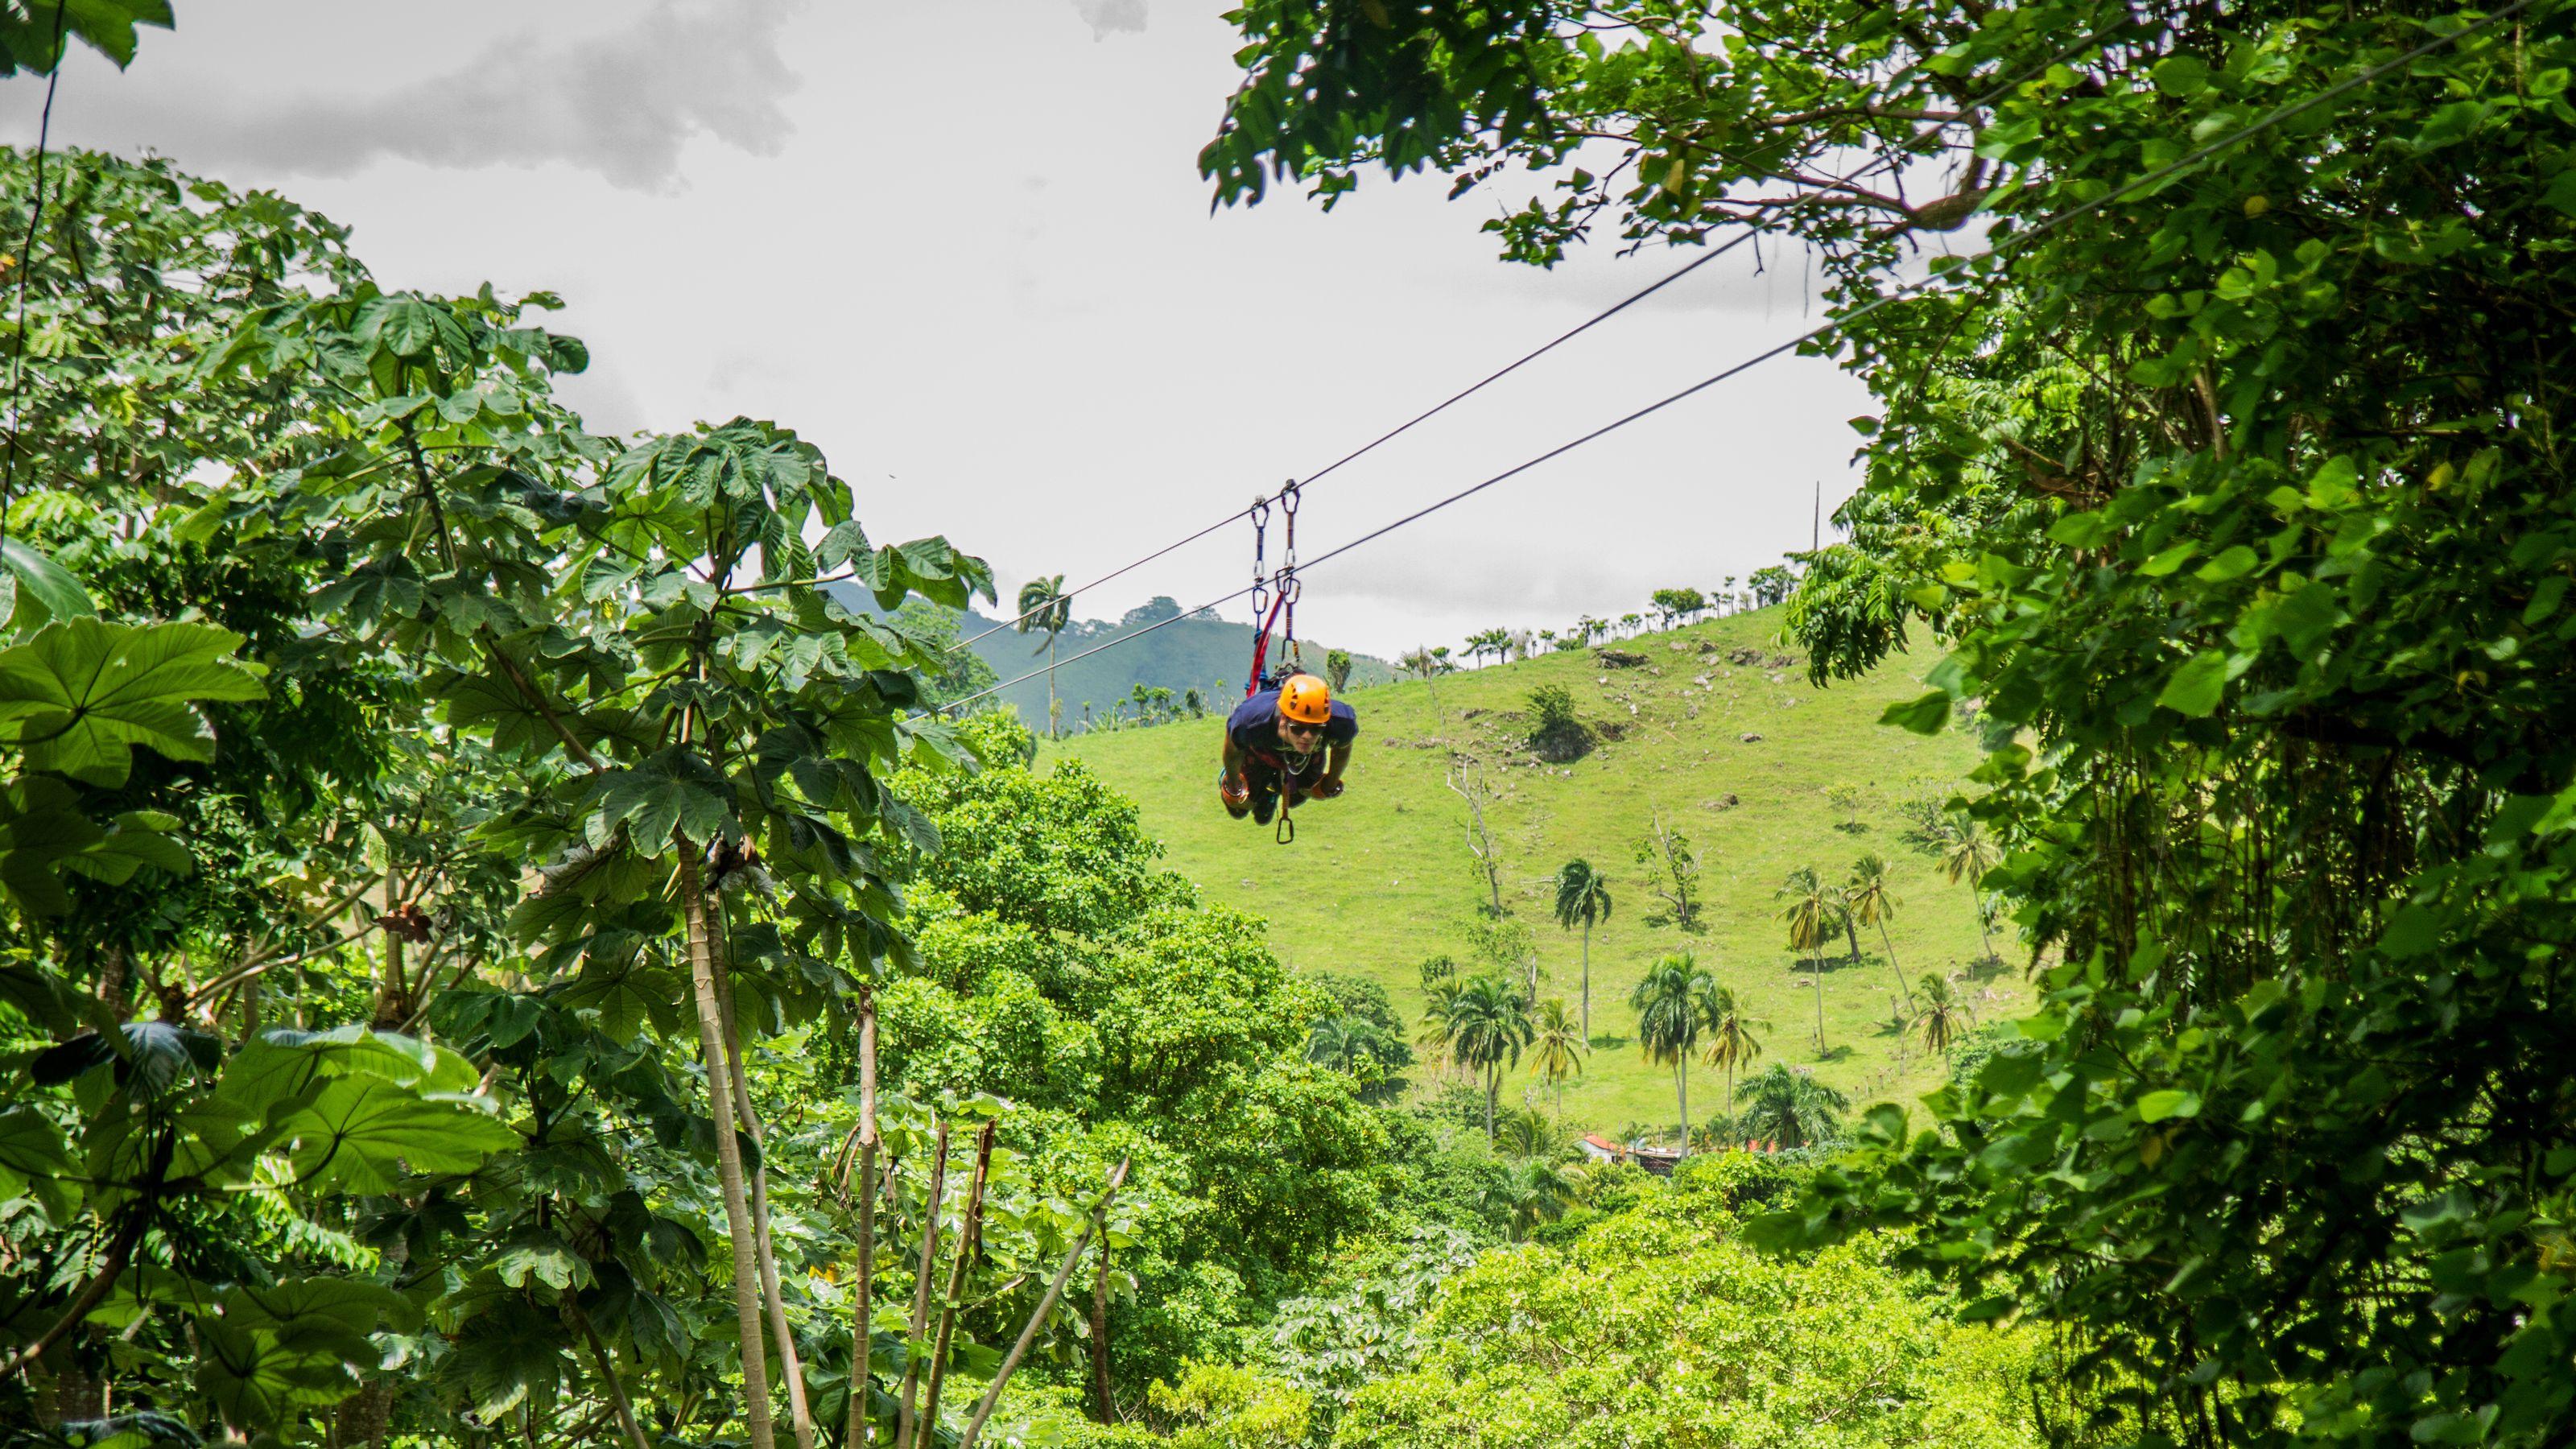 swinging in harness in Punta Cana